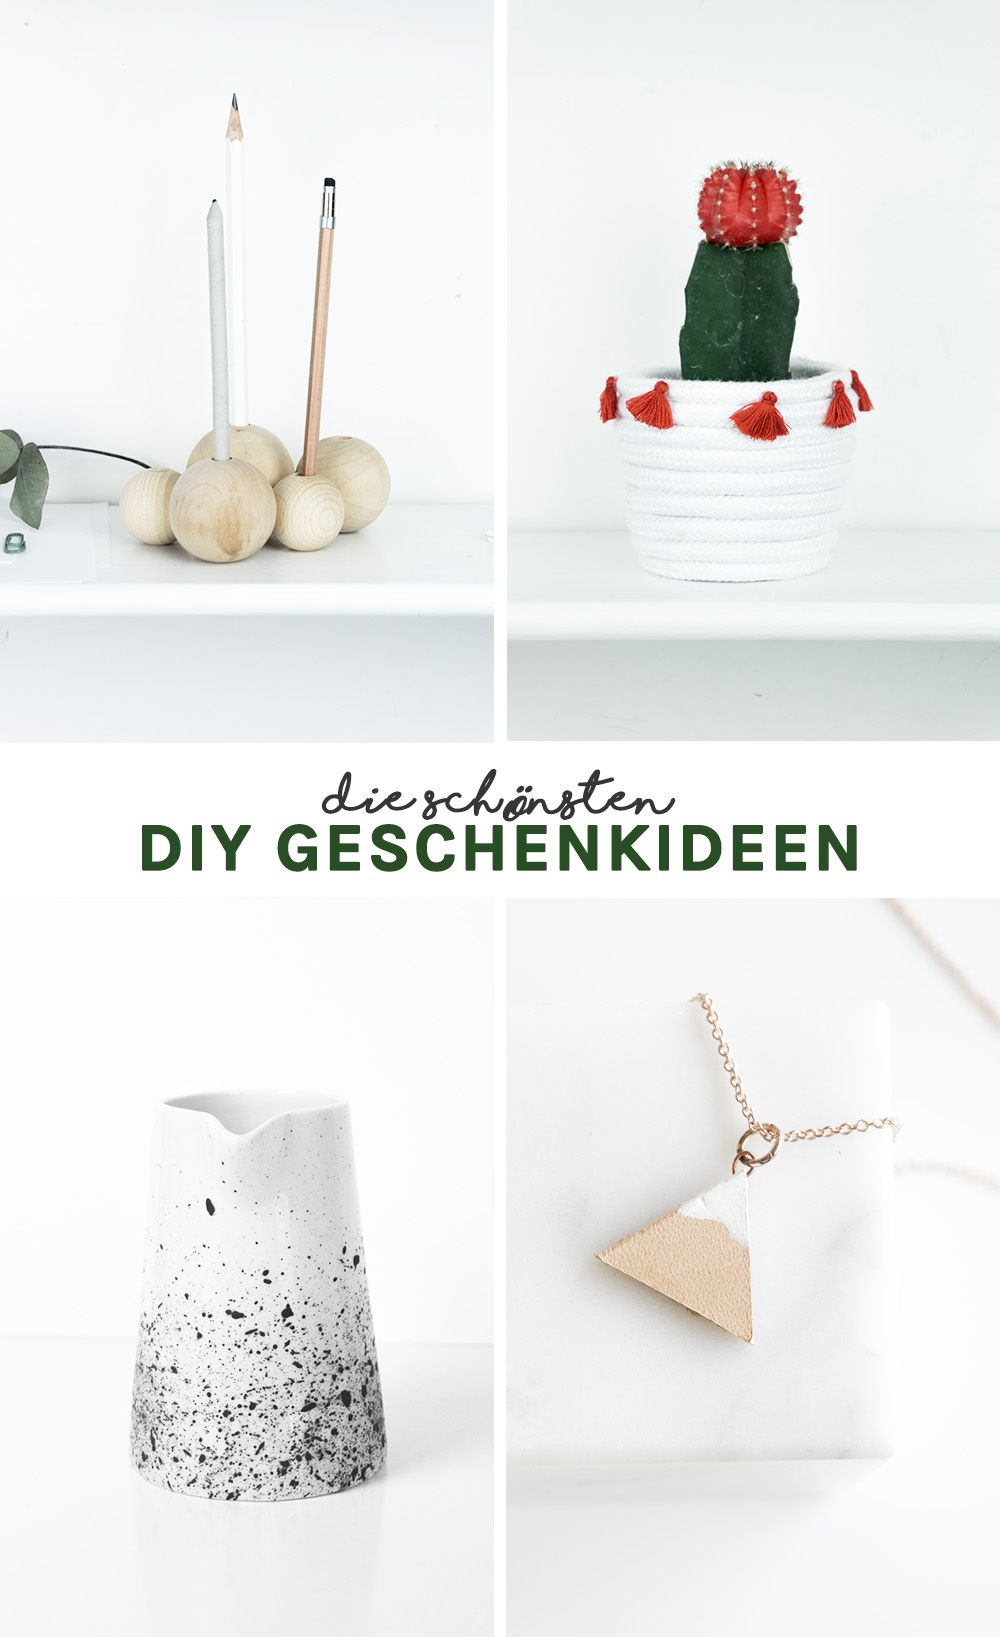 diy geschenke diy inspirationen pinterest diy geschenke geschenke und diy geschenke. Black Bedroom Furniture Sets. Home Design Ideas